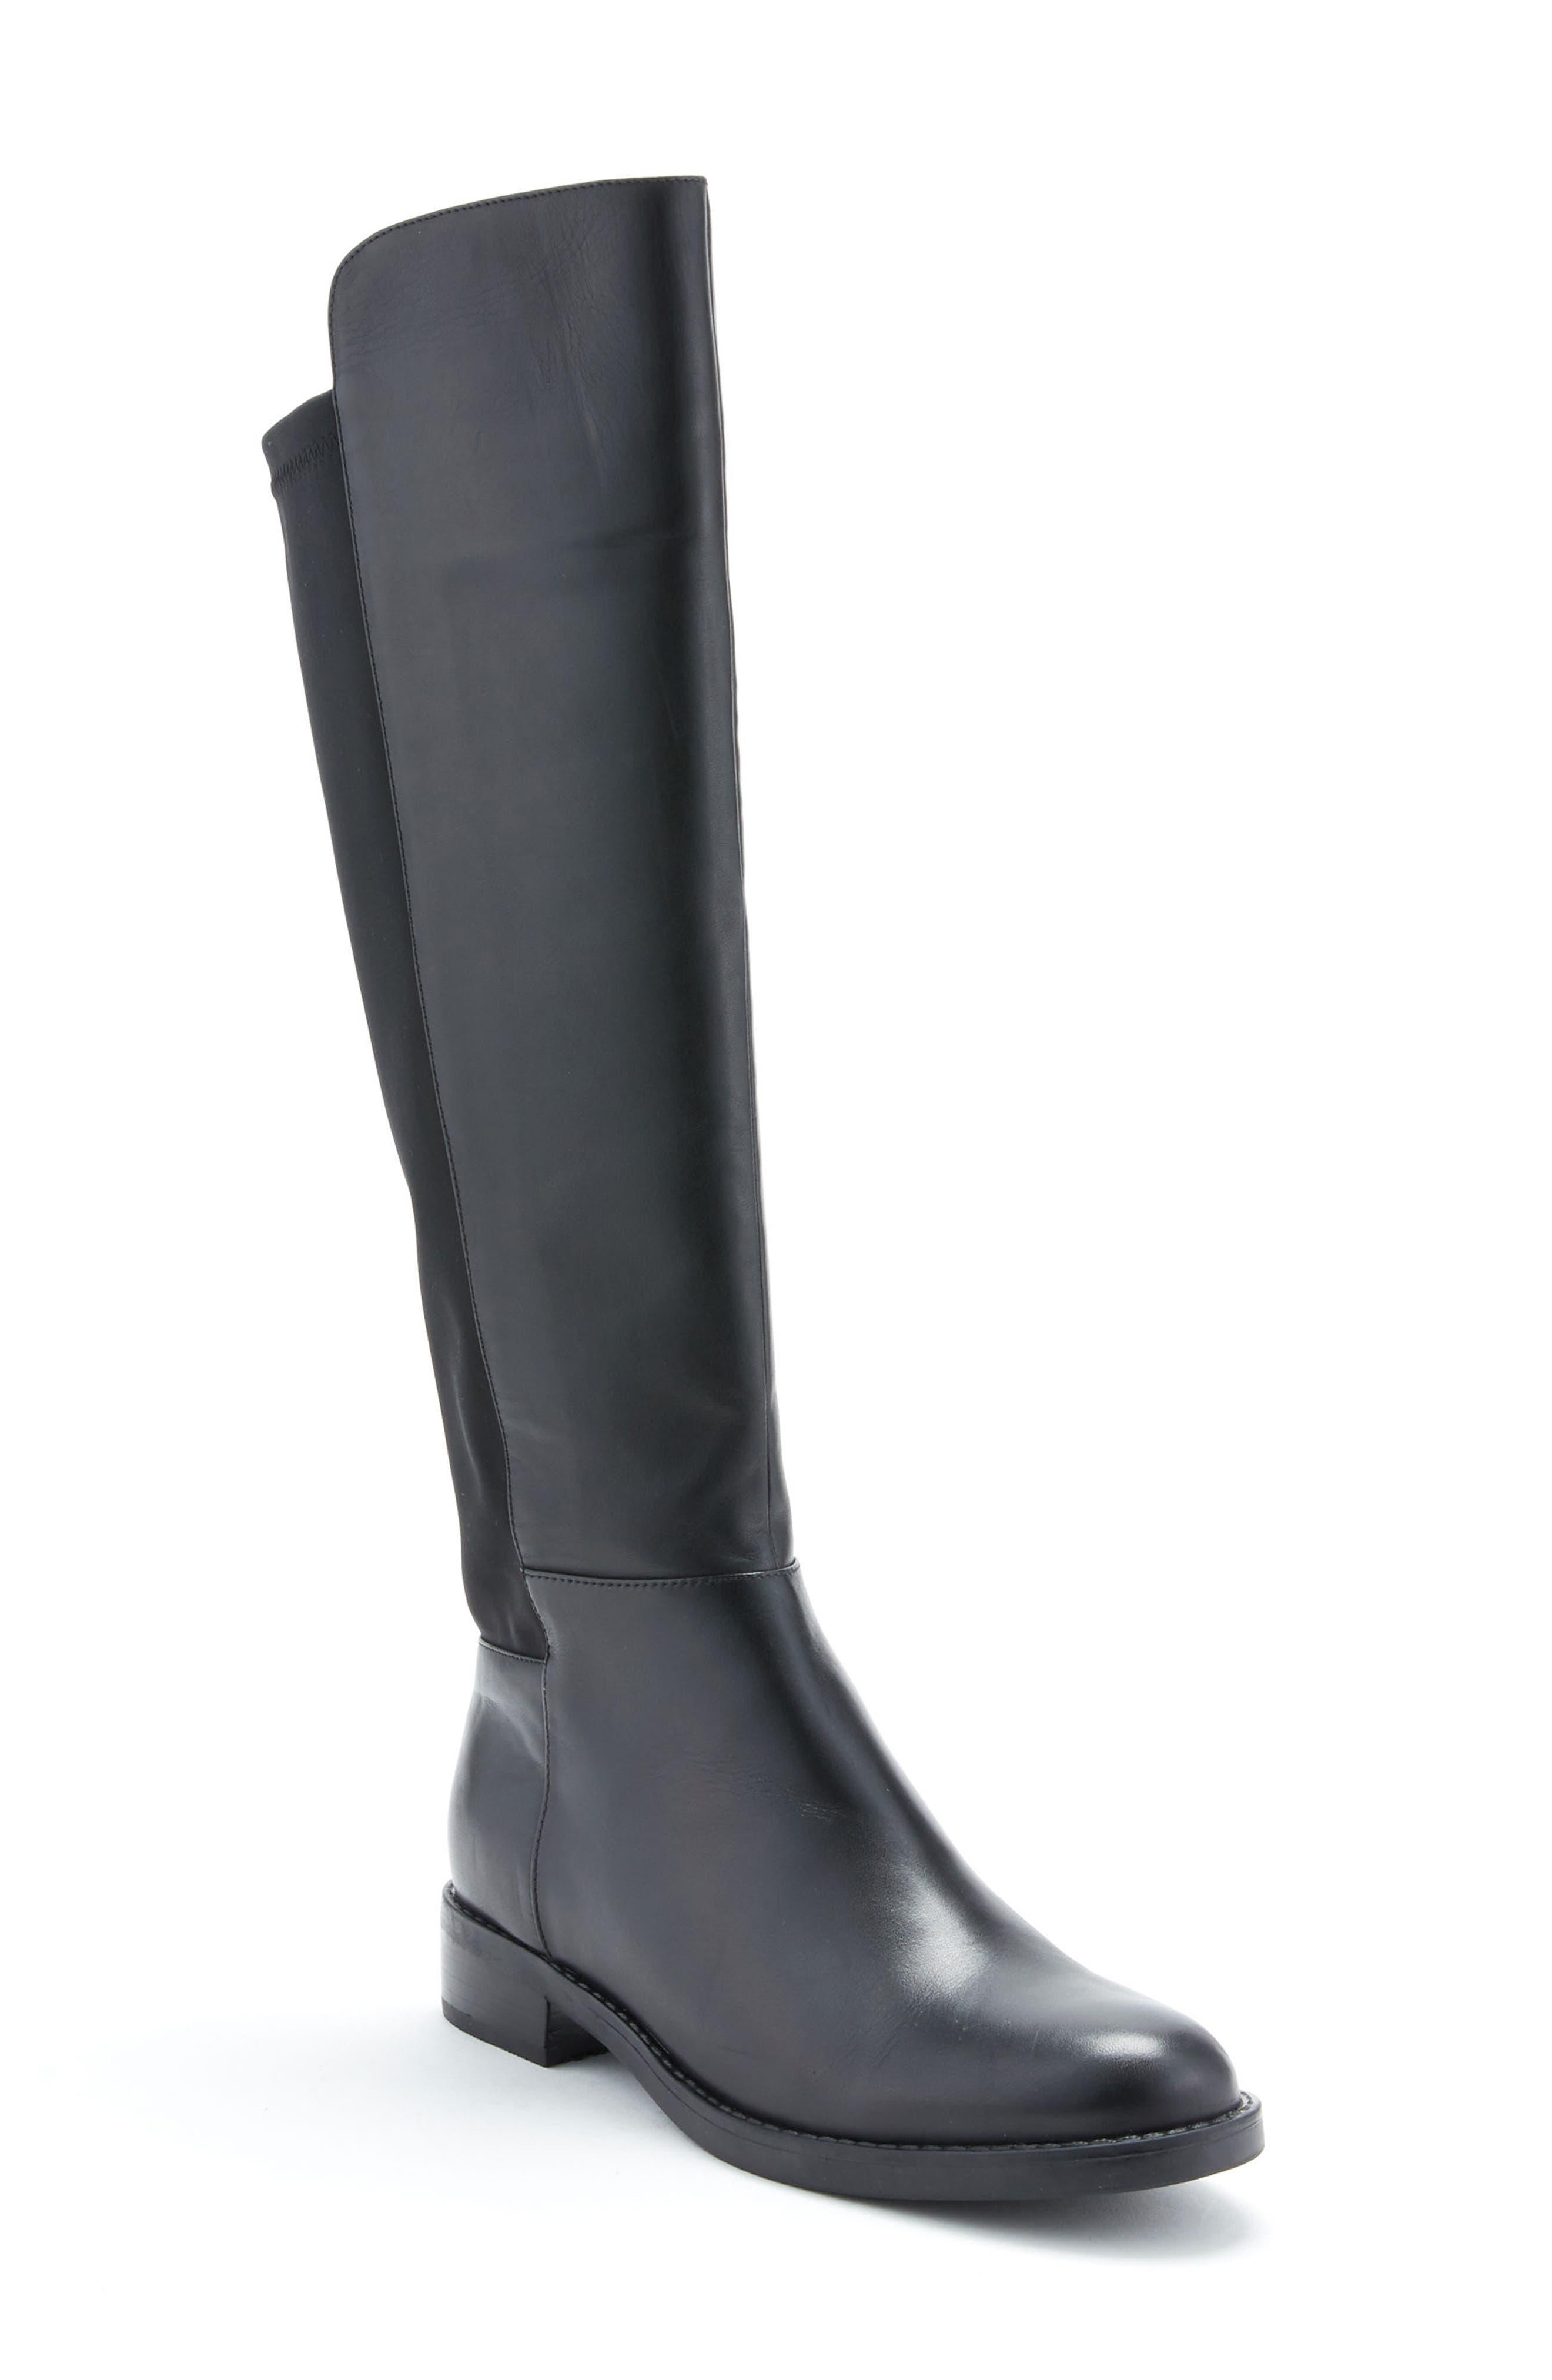 Blondo Ellie Waterproof Knee High Riding Boot (Women)